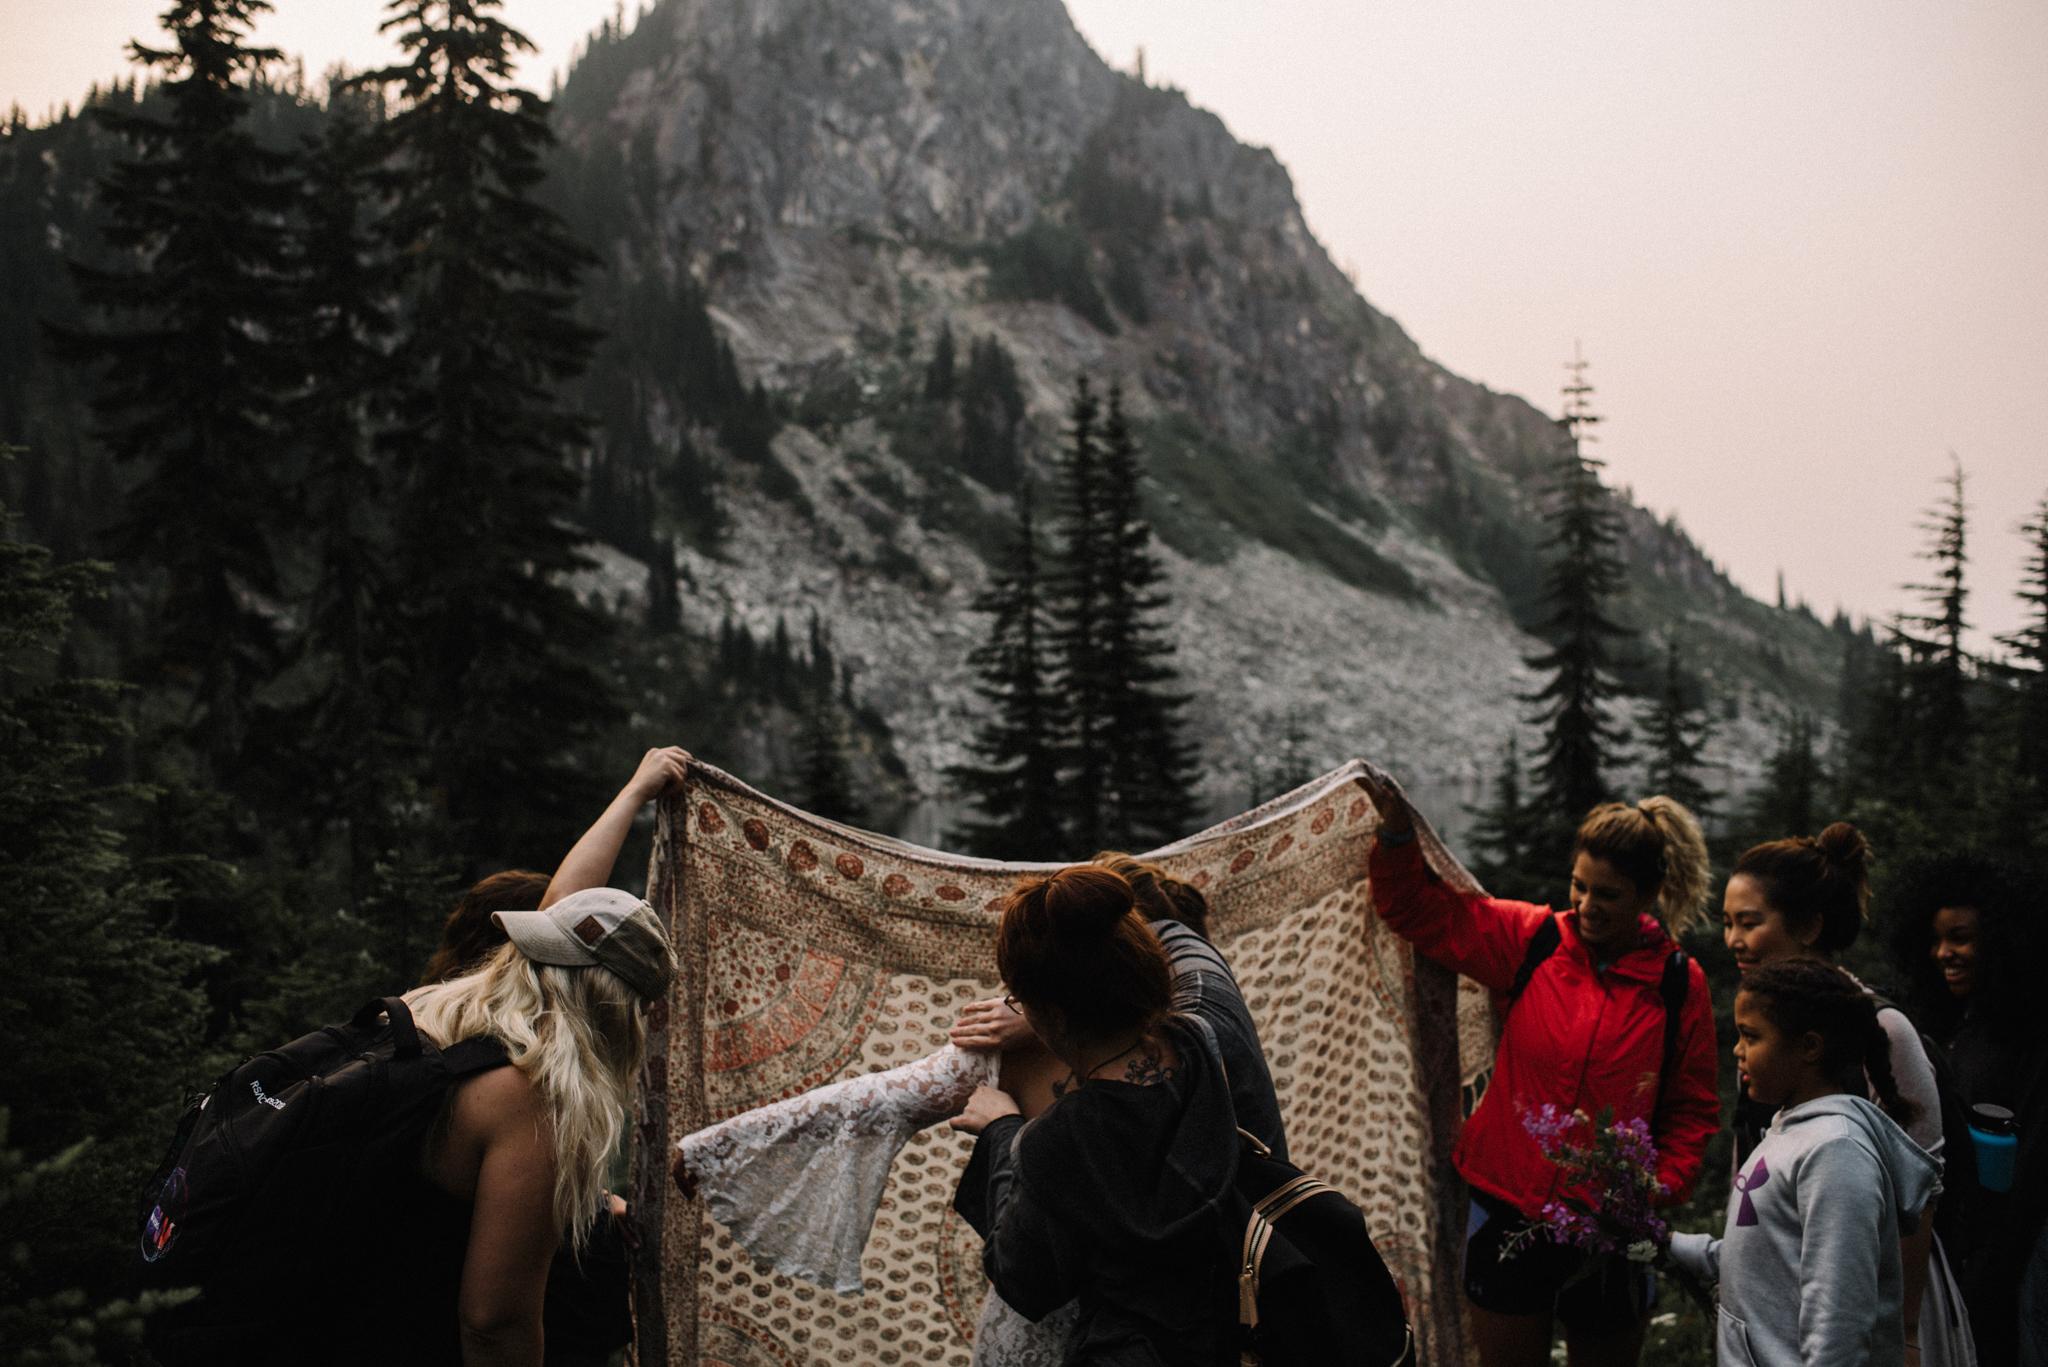 Megan and Andrew Lake Valhalla Washington PNW Adventure Elopement White Sails Creative Sunrise Hike_47.JPG